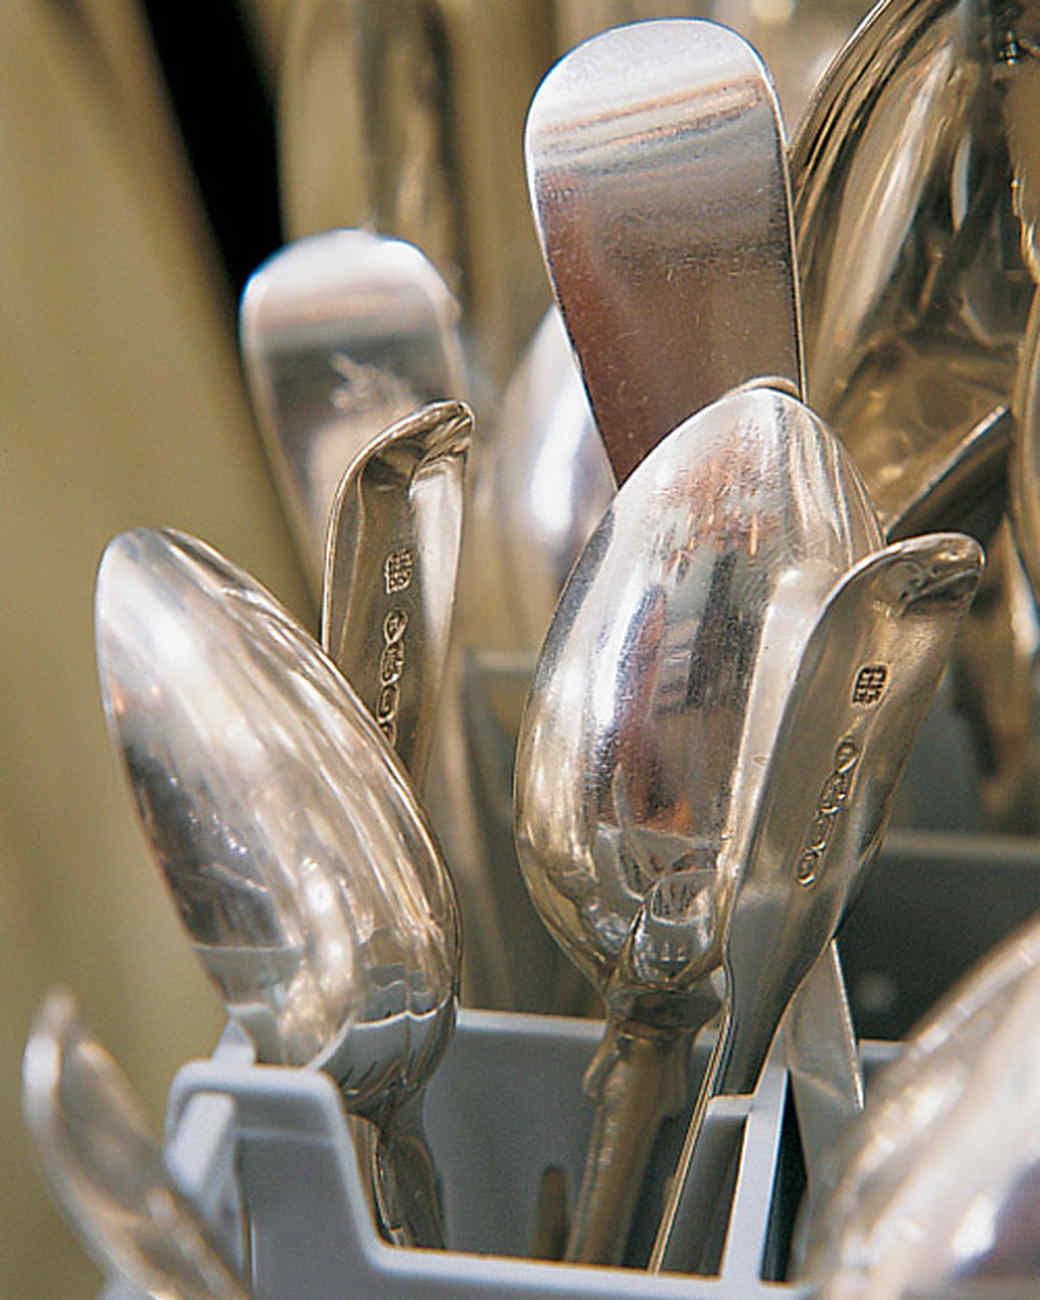 ml711_1197_dishwasher_spoons.jpg